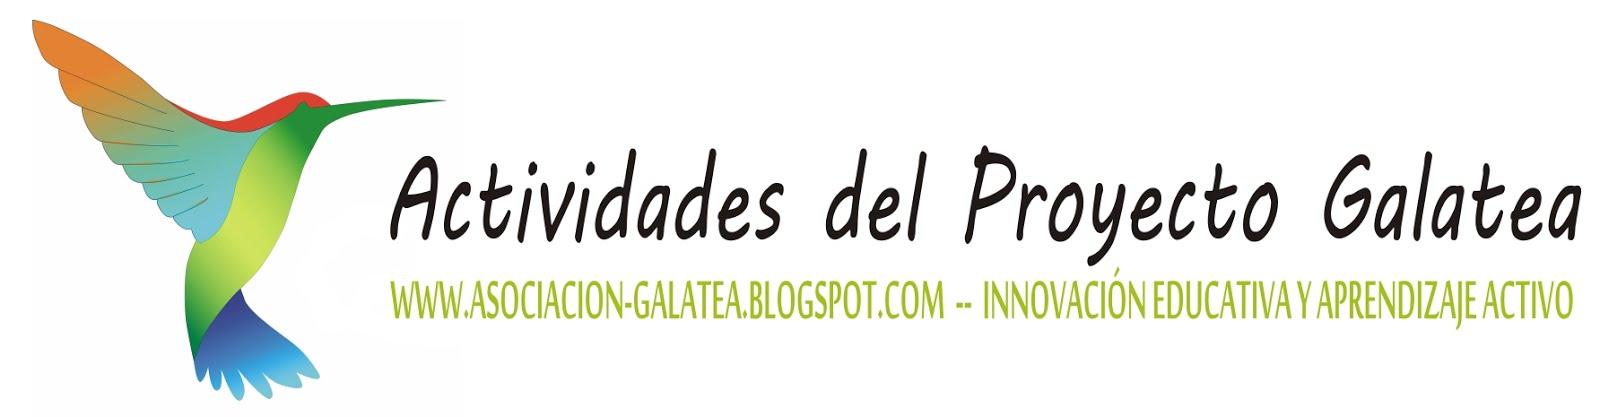 Actividades Proyecto Galatea